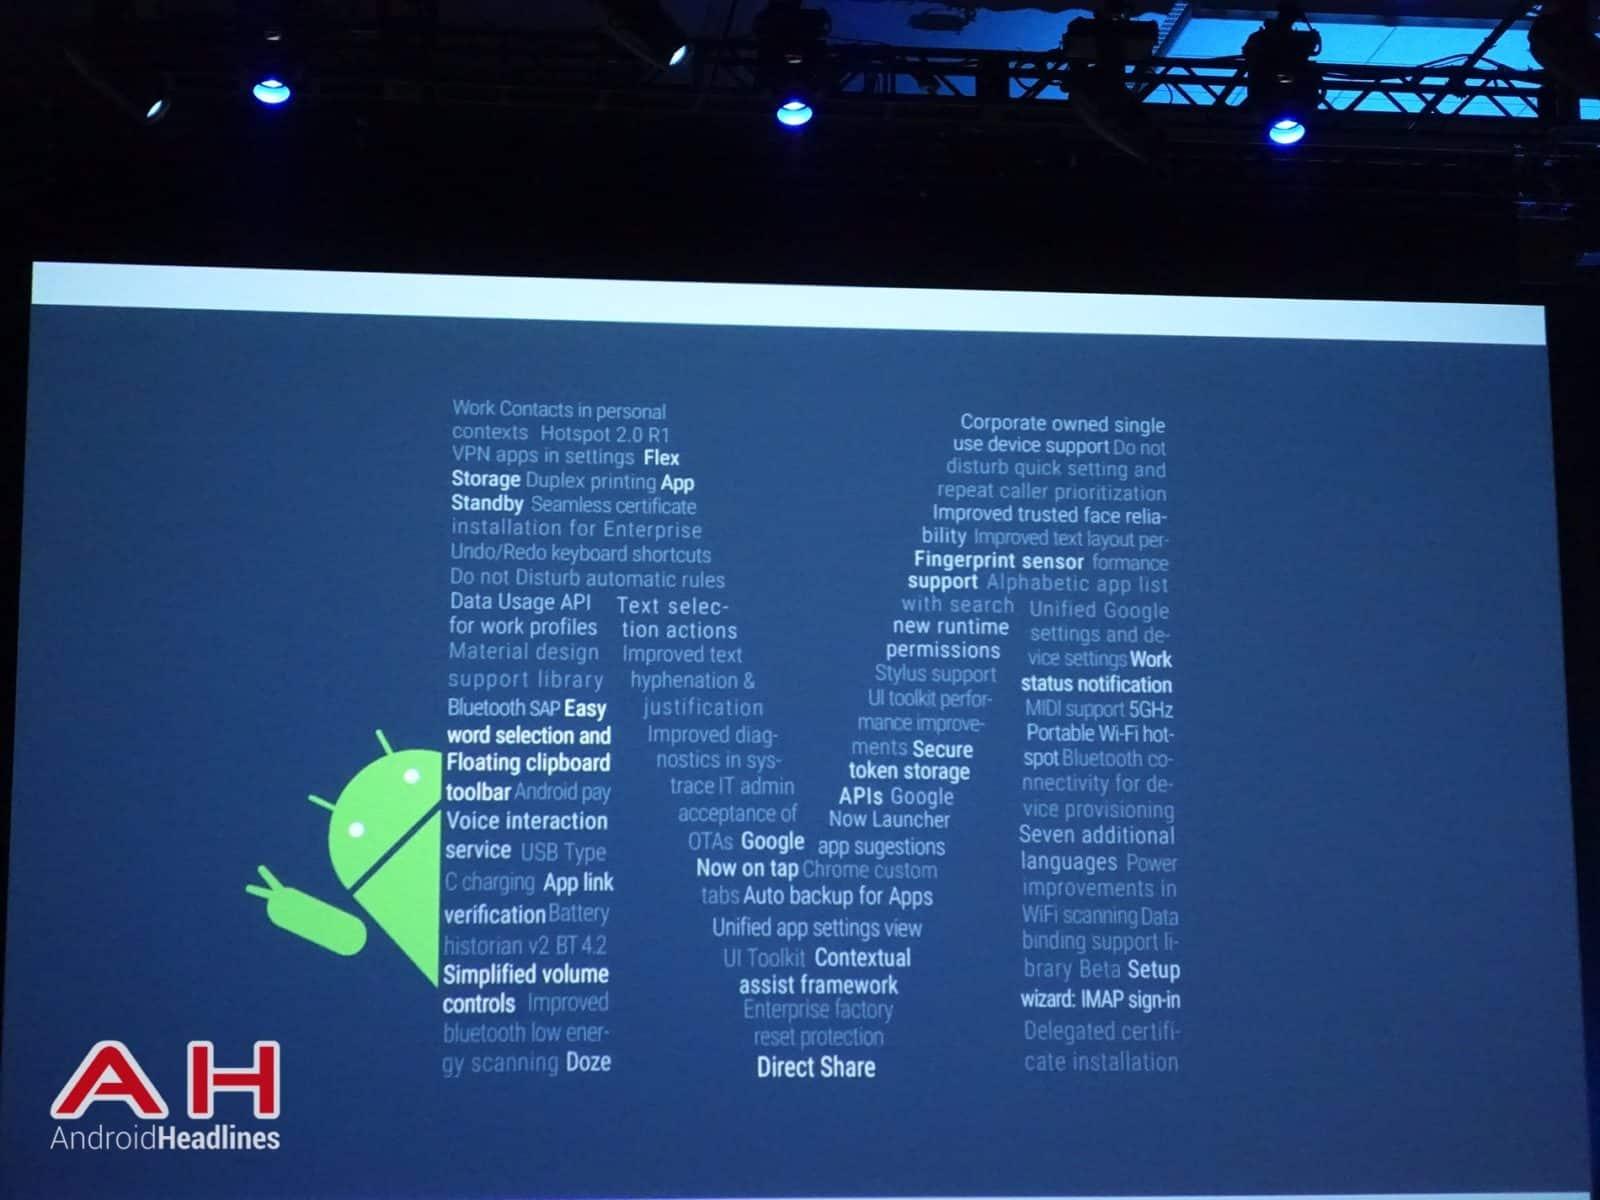 Google IO 15 Keynote AH 28